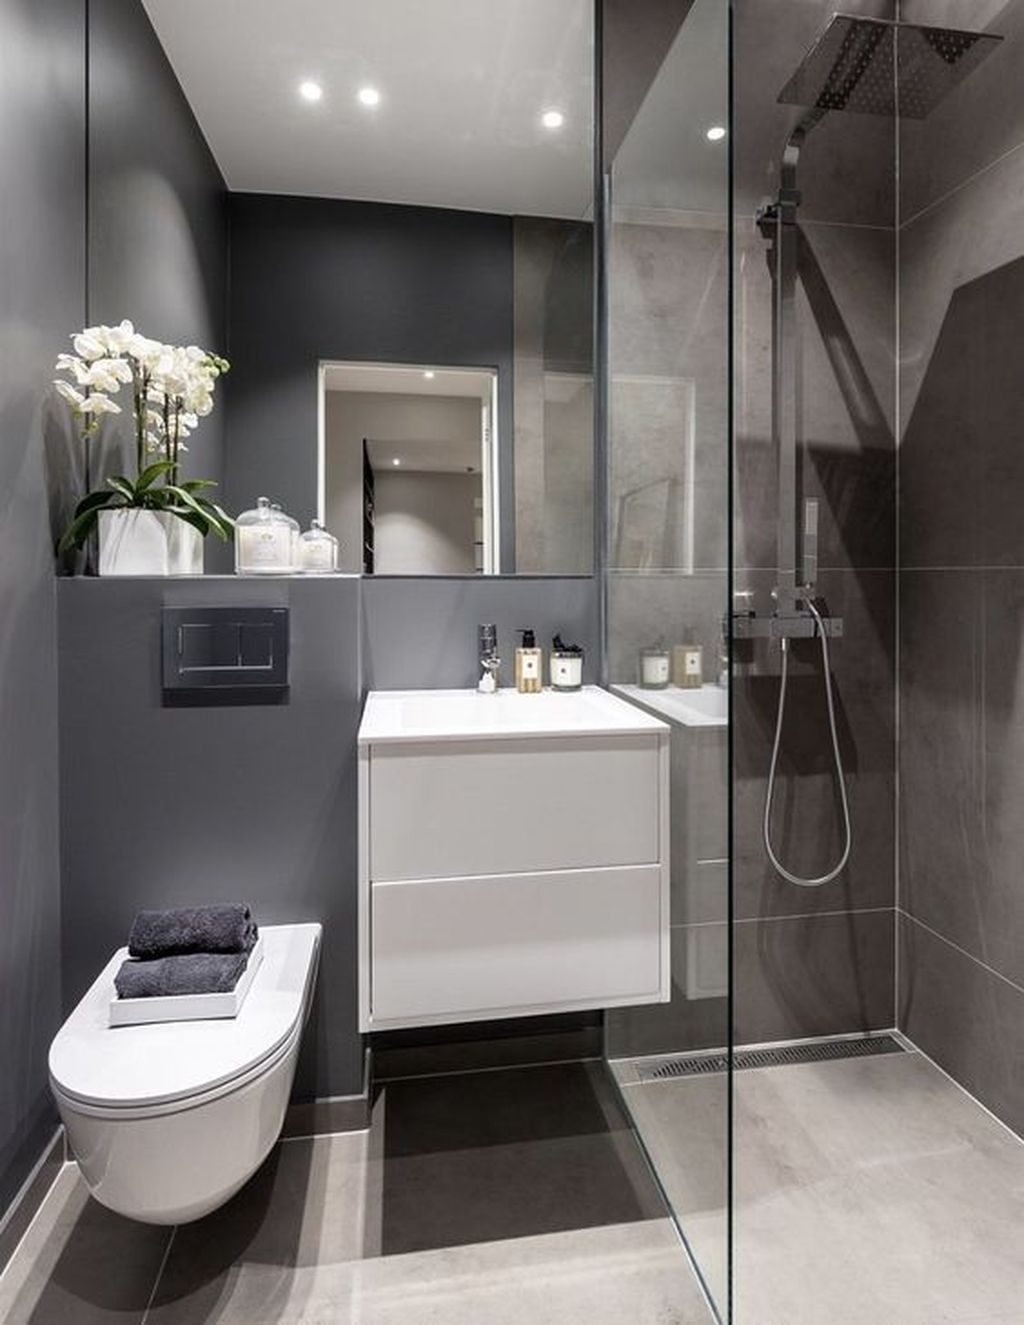 Fabulous Minimalist Bathroom Decor Ideas That Become Everyones Dream 07